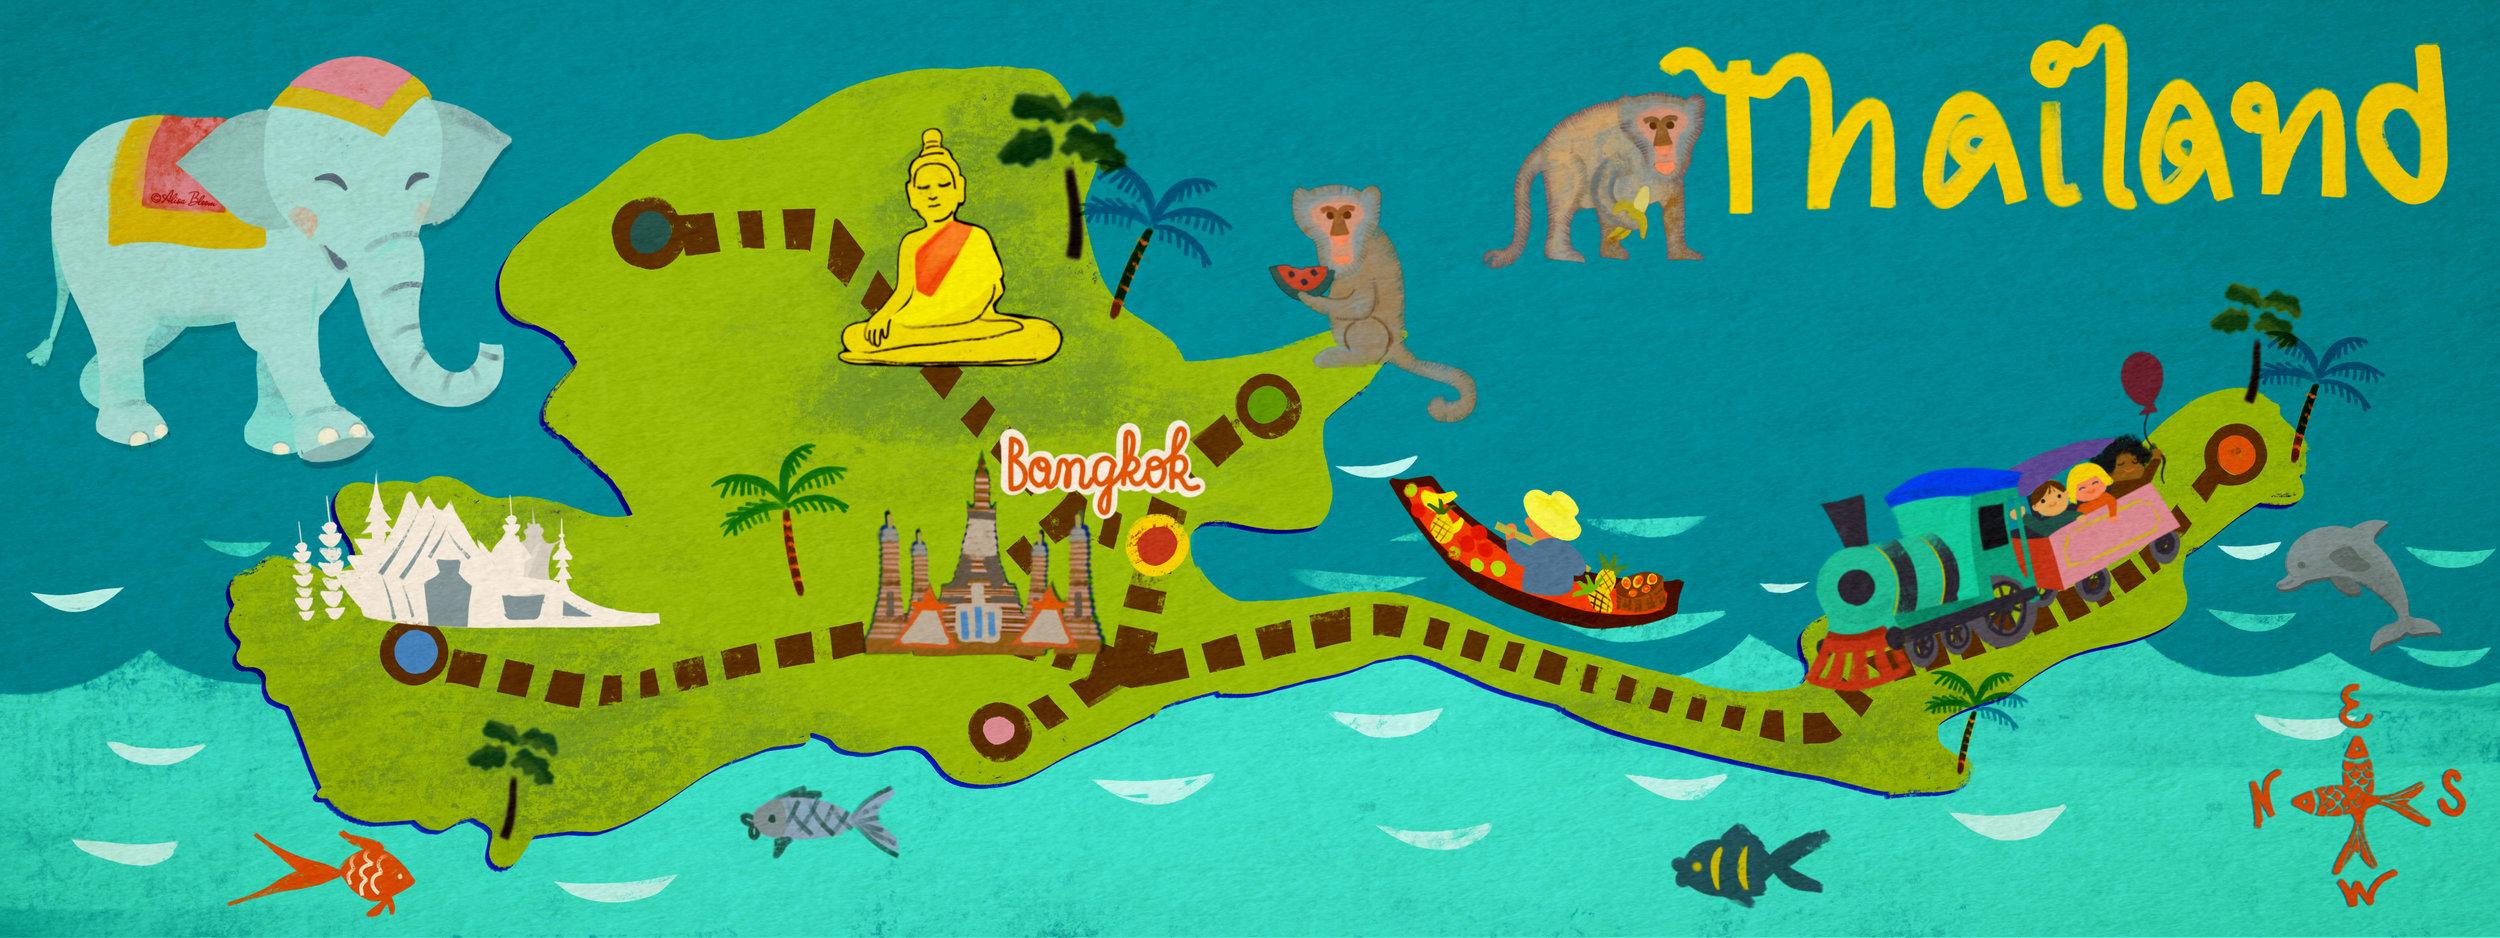 Thailand-illustrated-map-travel.jpg